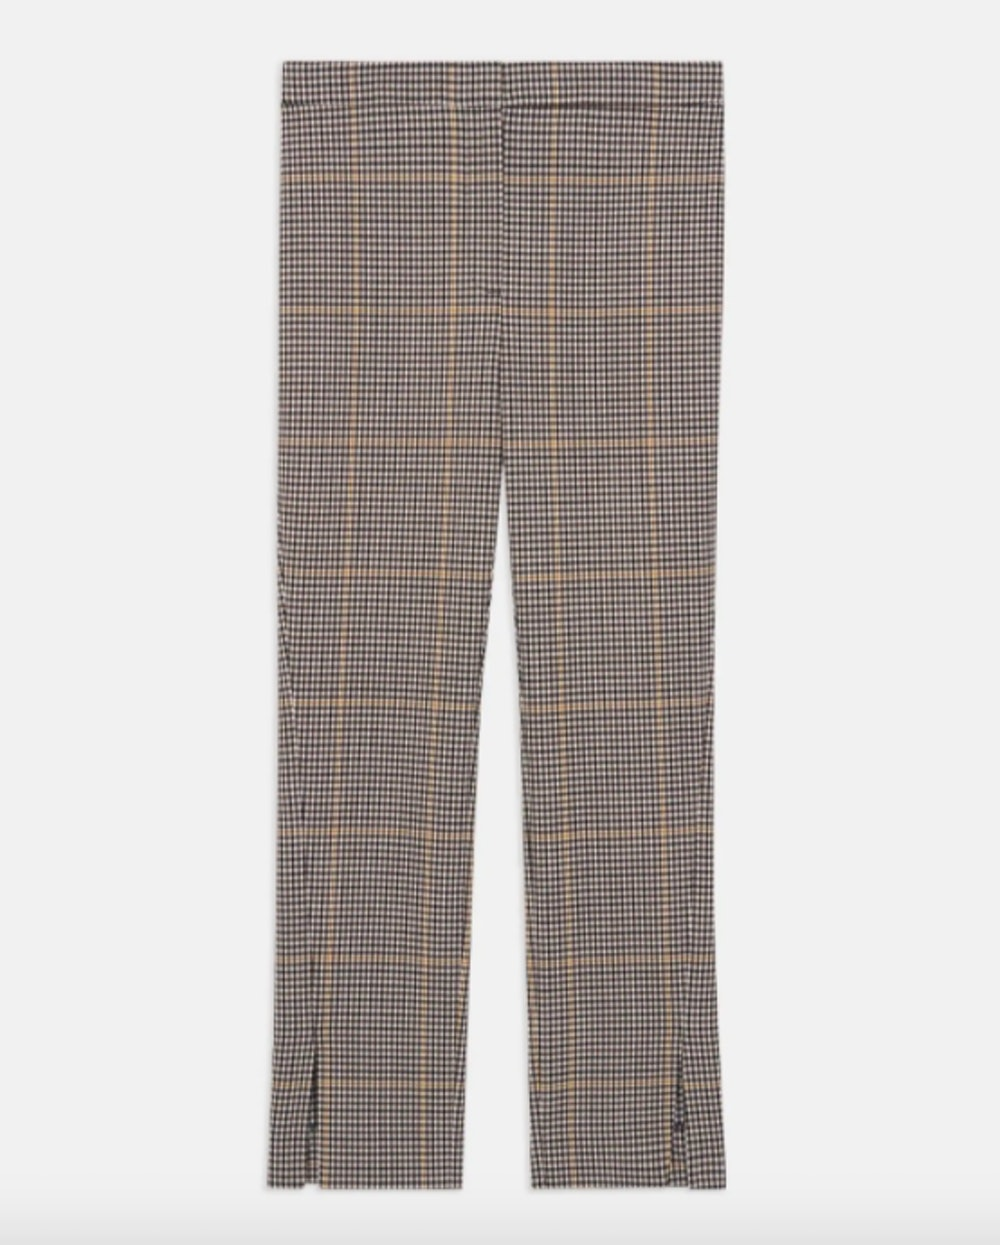 Straight Slit Pant in Plaid Wool